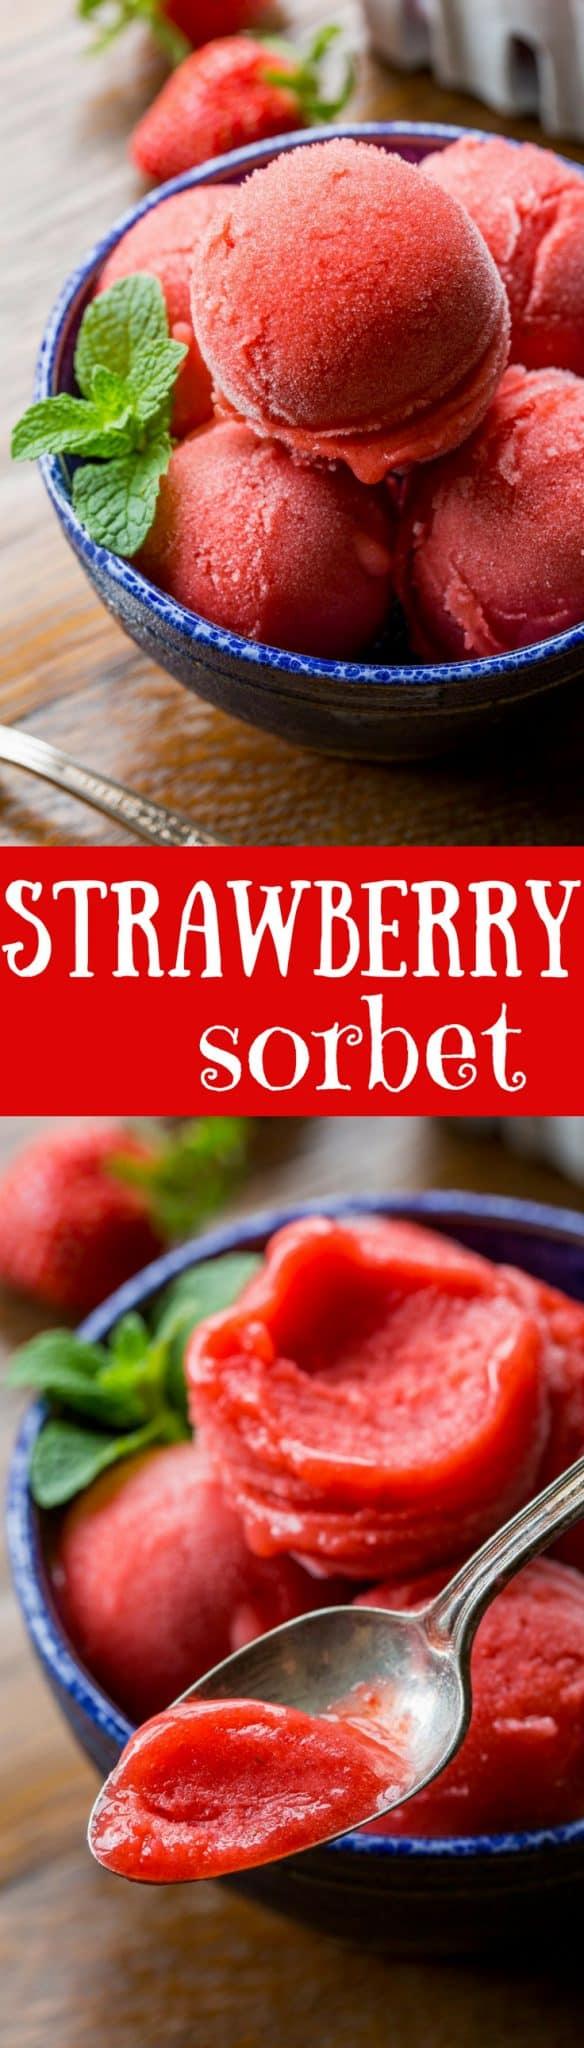 Easy Strawberry Sorbet Recipe - Saving Room for Dessert